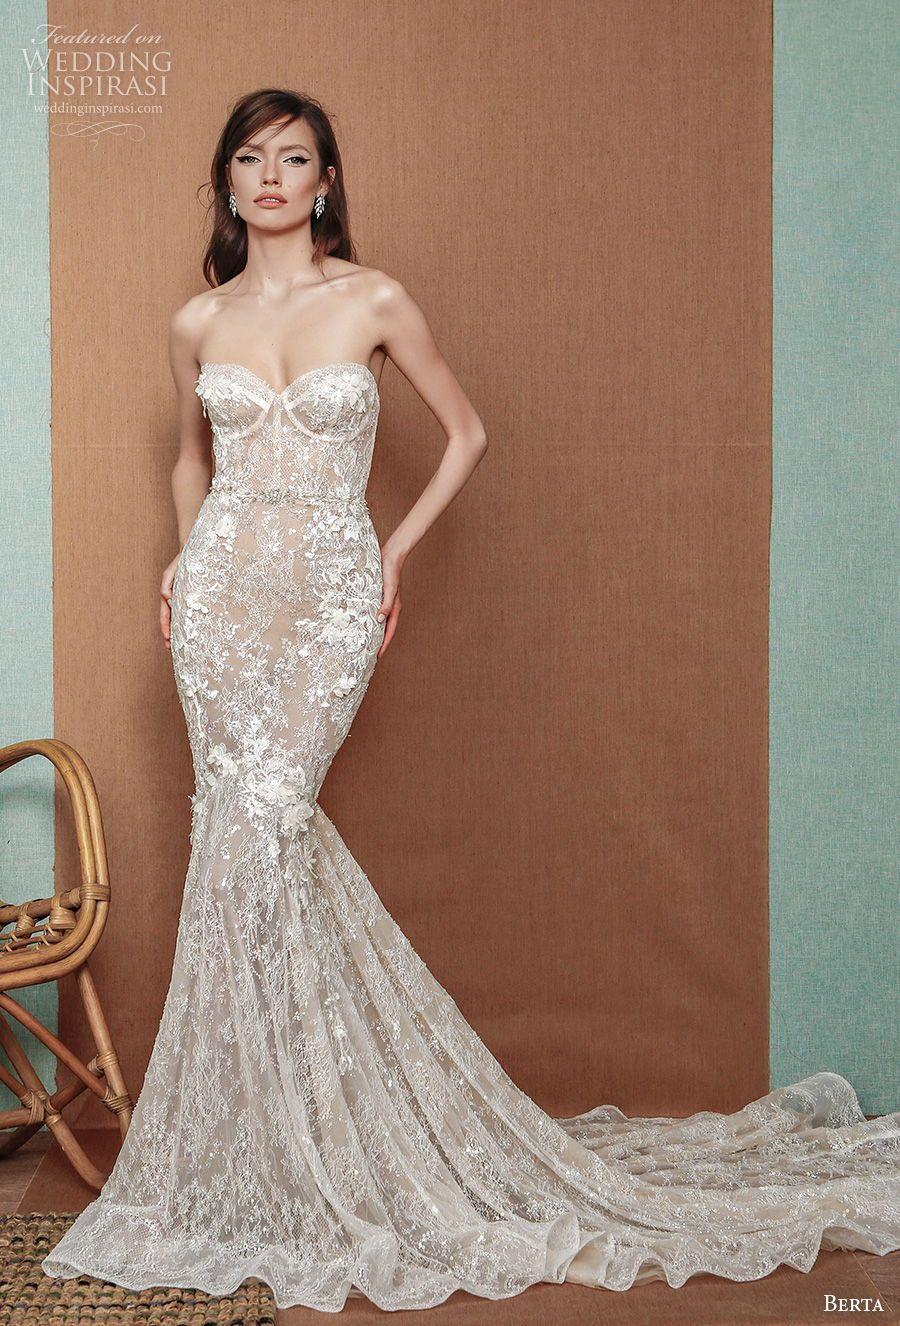 Berta Privee Spring 2021 Wedding Dresses Wedding Inspirasi Wedding Dresses Bridal Gowns Mermaid Mermaid Wedding Dress [ 1326 x 900 Pixel ]